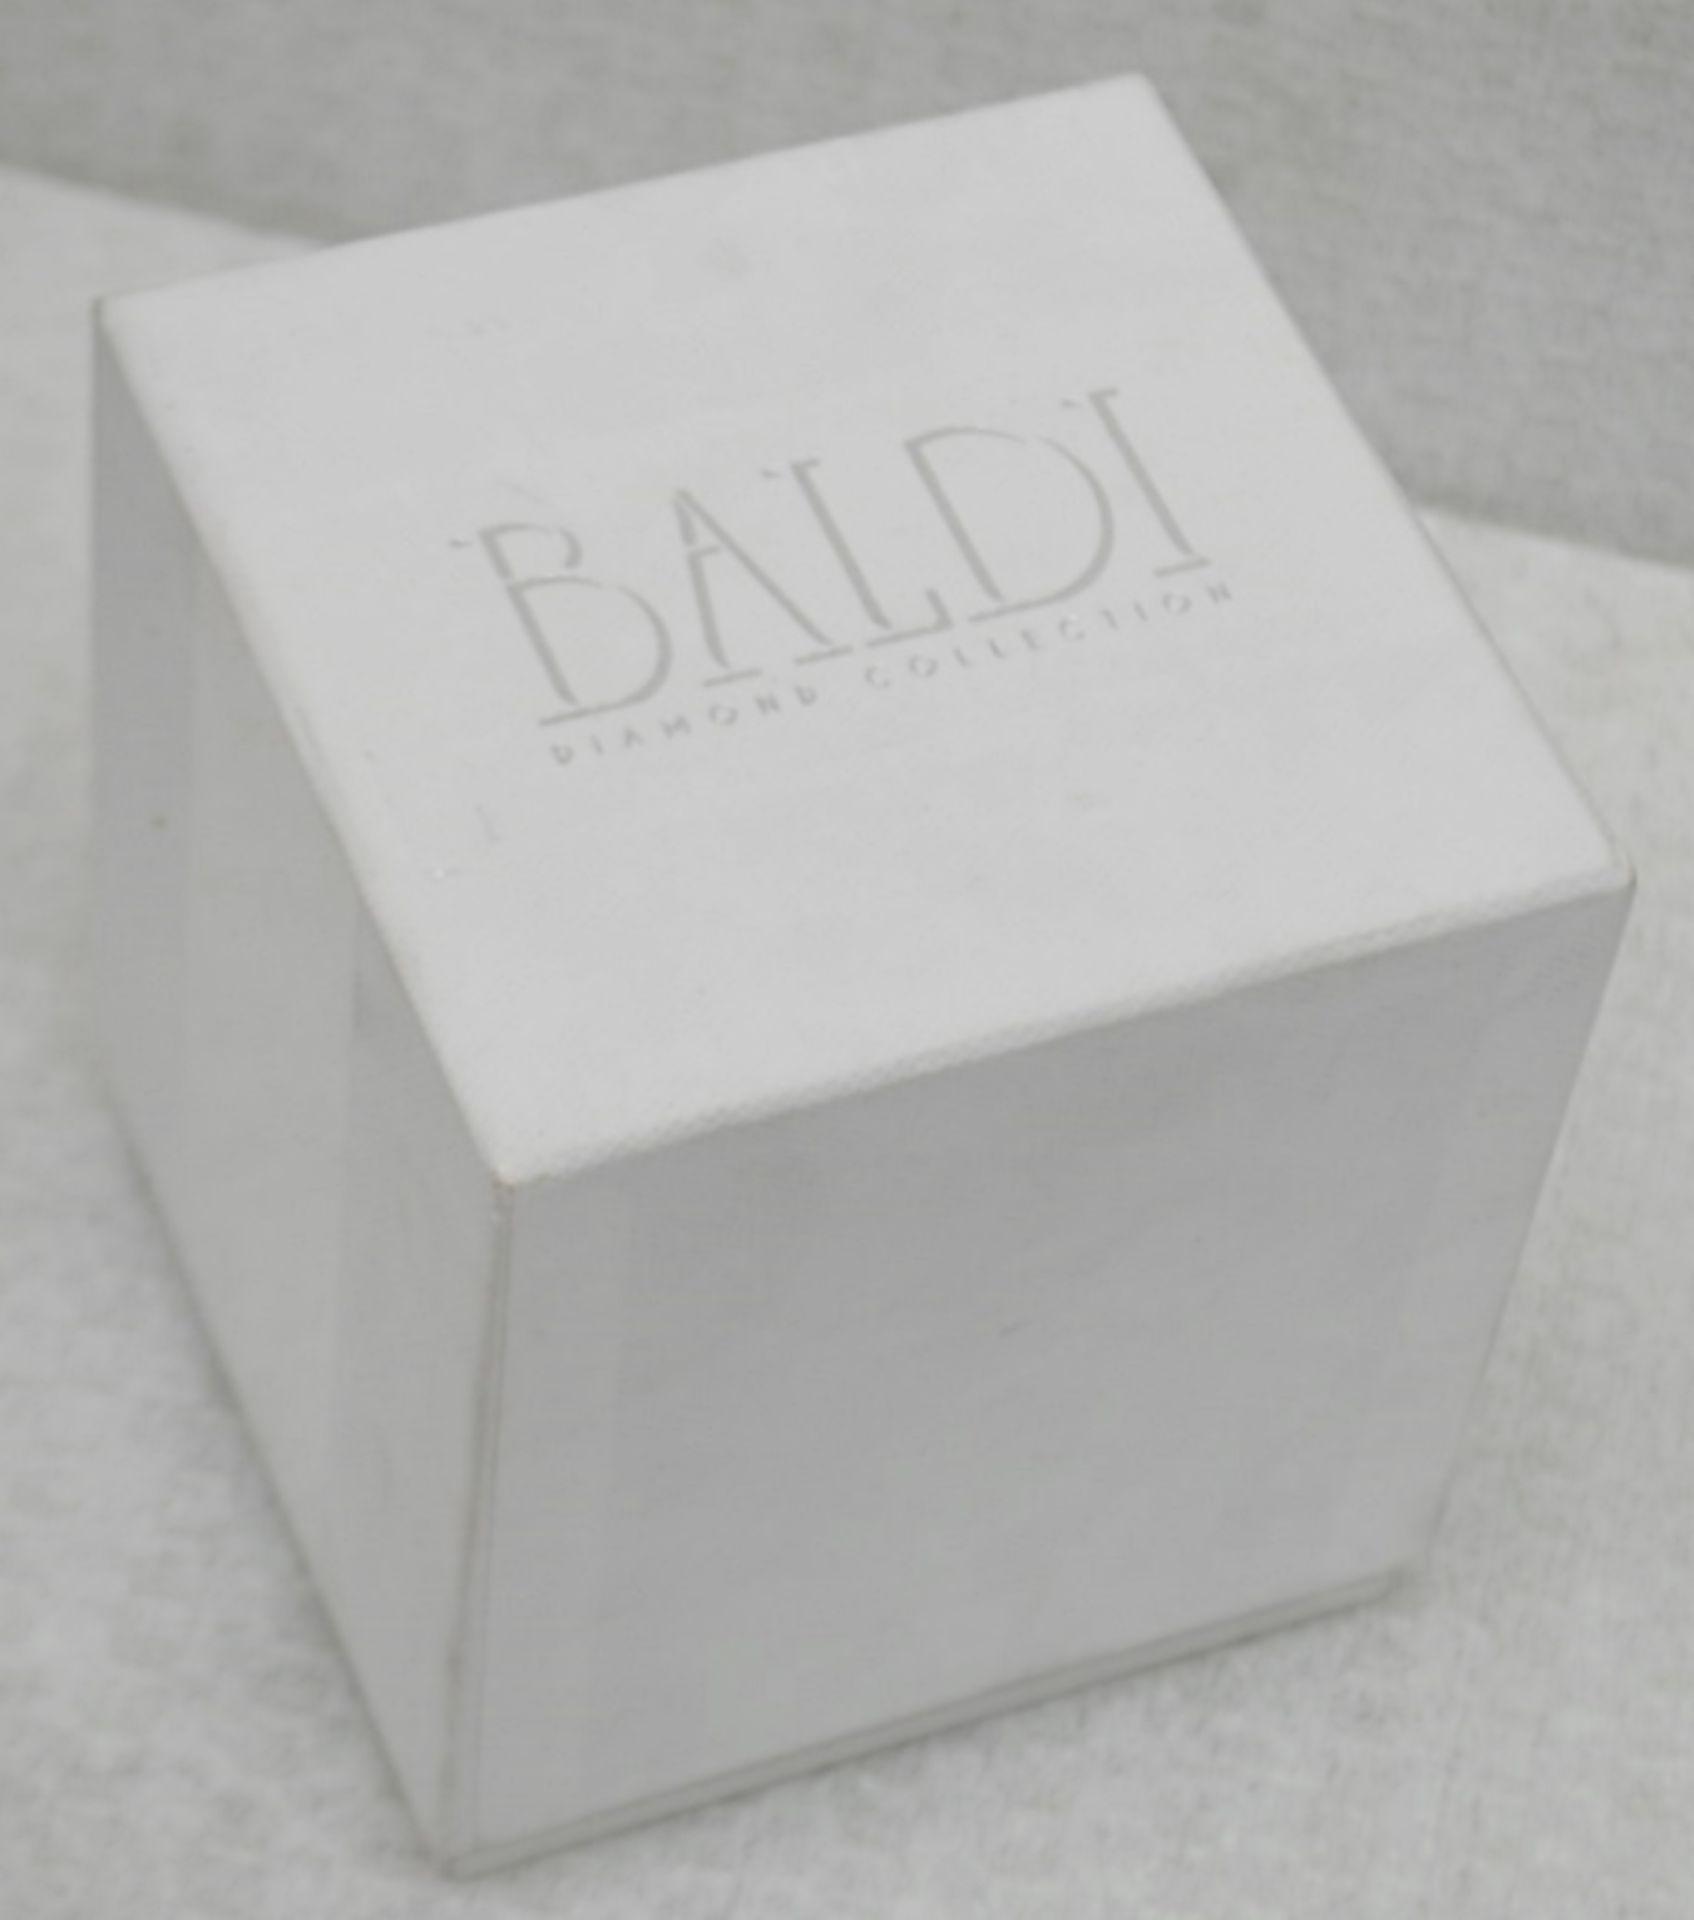 1 x BALDI 'Home Jewels' Italian Hand-crafted Artisan Clear Diamond Crystal Perfume Box, With A - Image 2 of 5